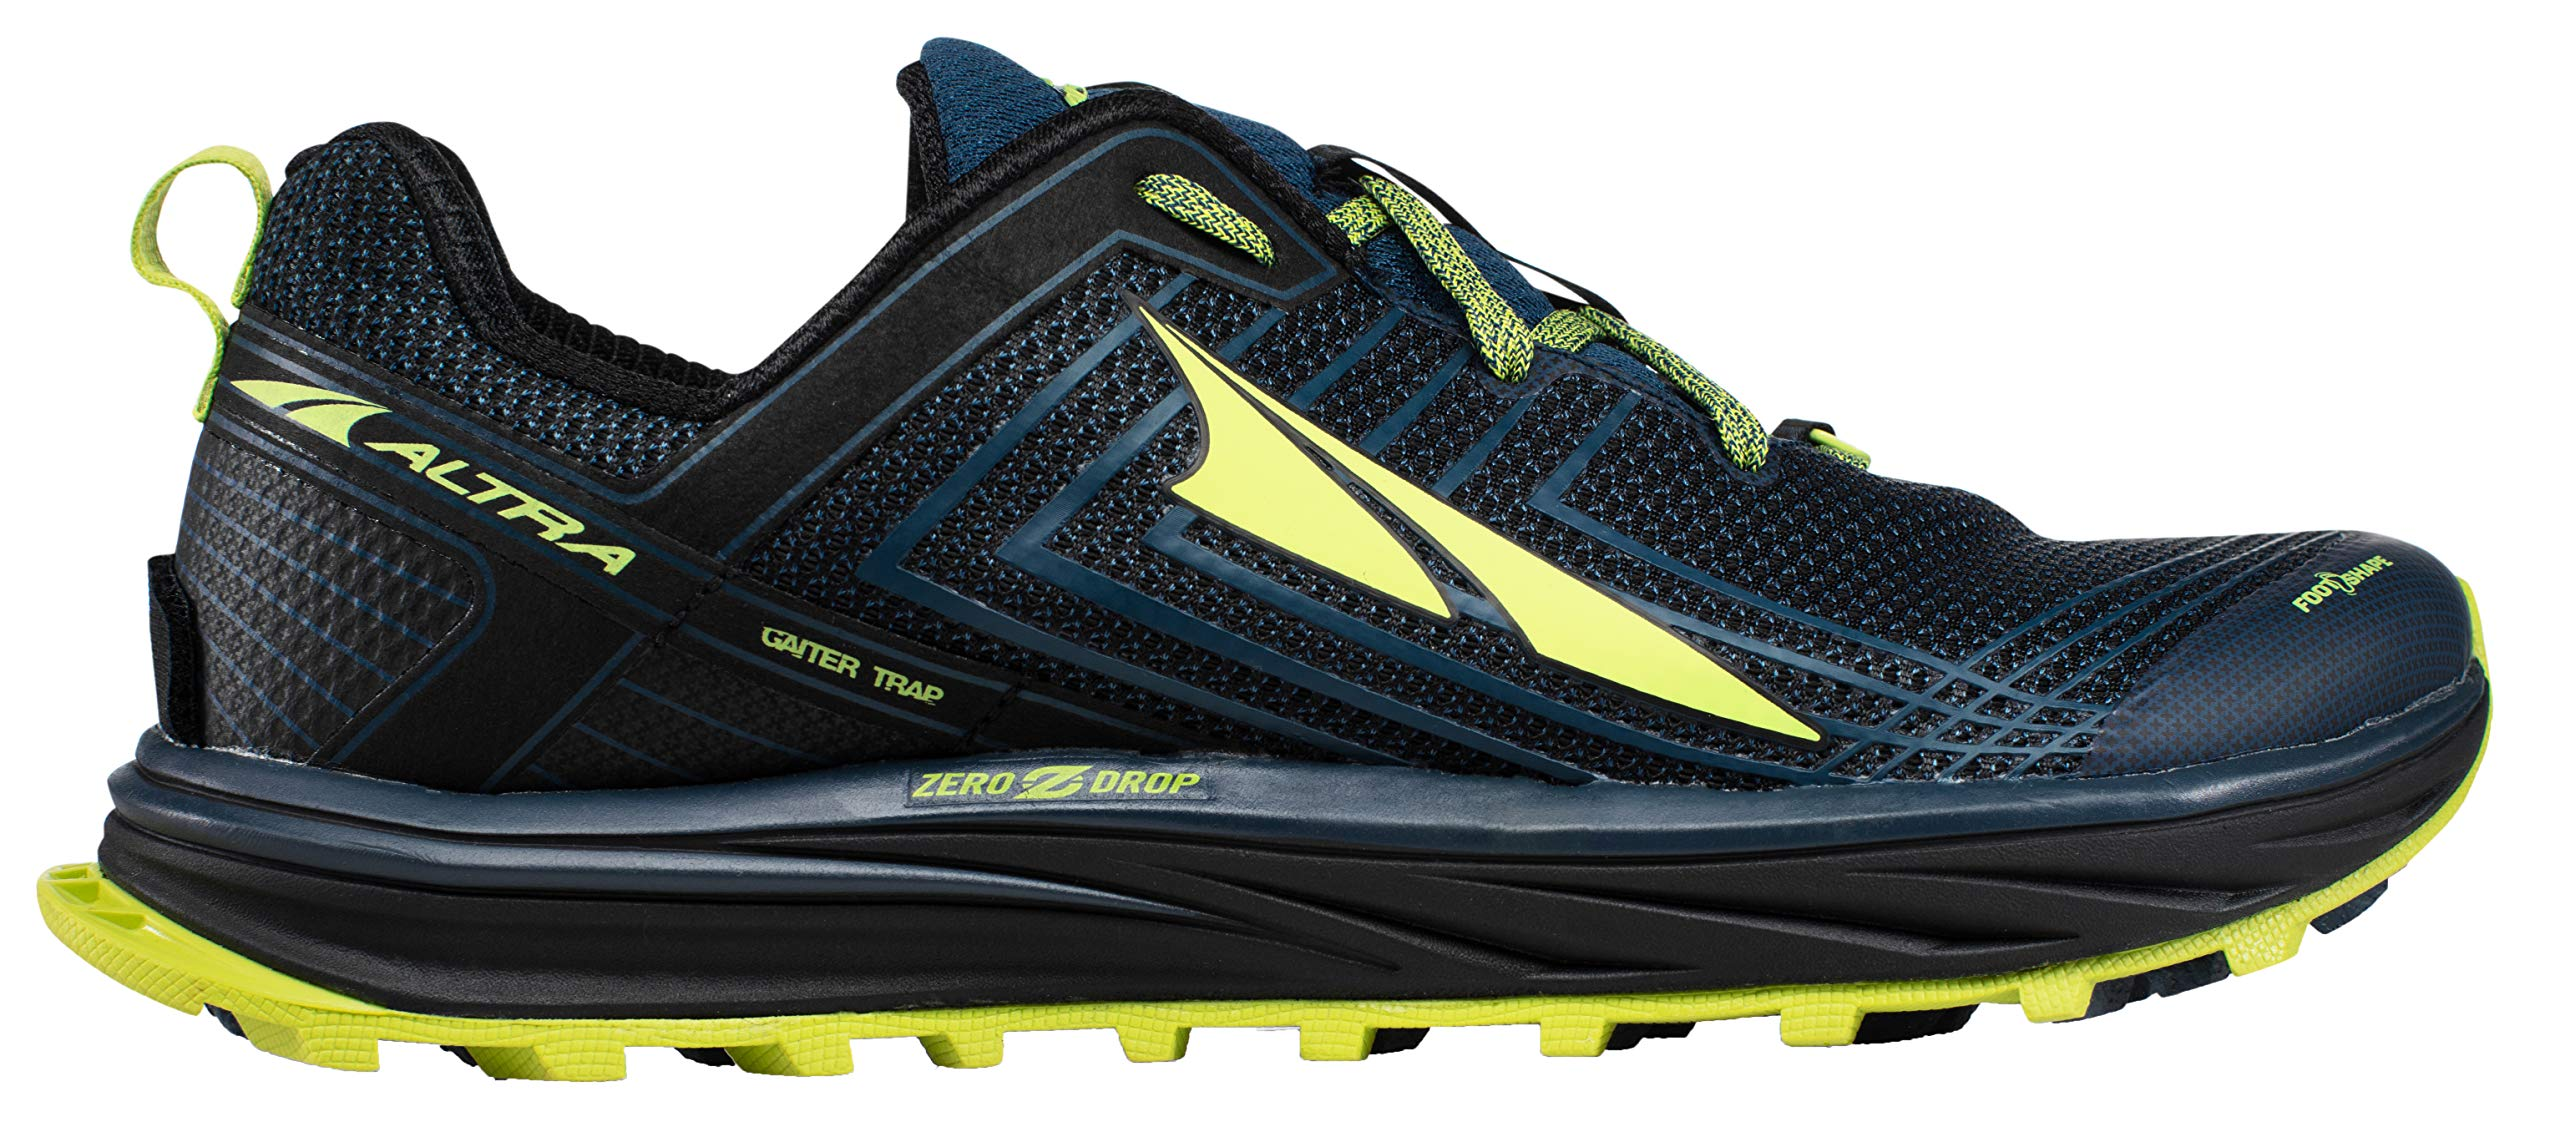 Altra AFM1957F Men's TIMP 1.5 Trail Running Shoe, Blue/Lime - 8 D(M) US